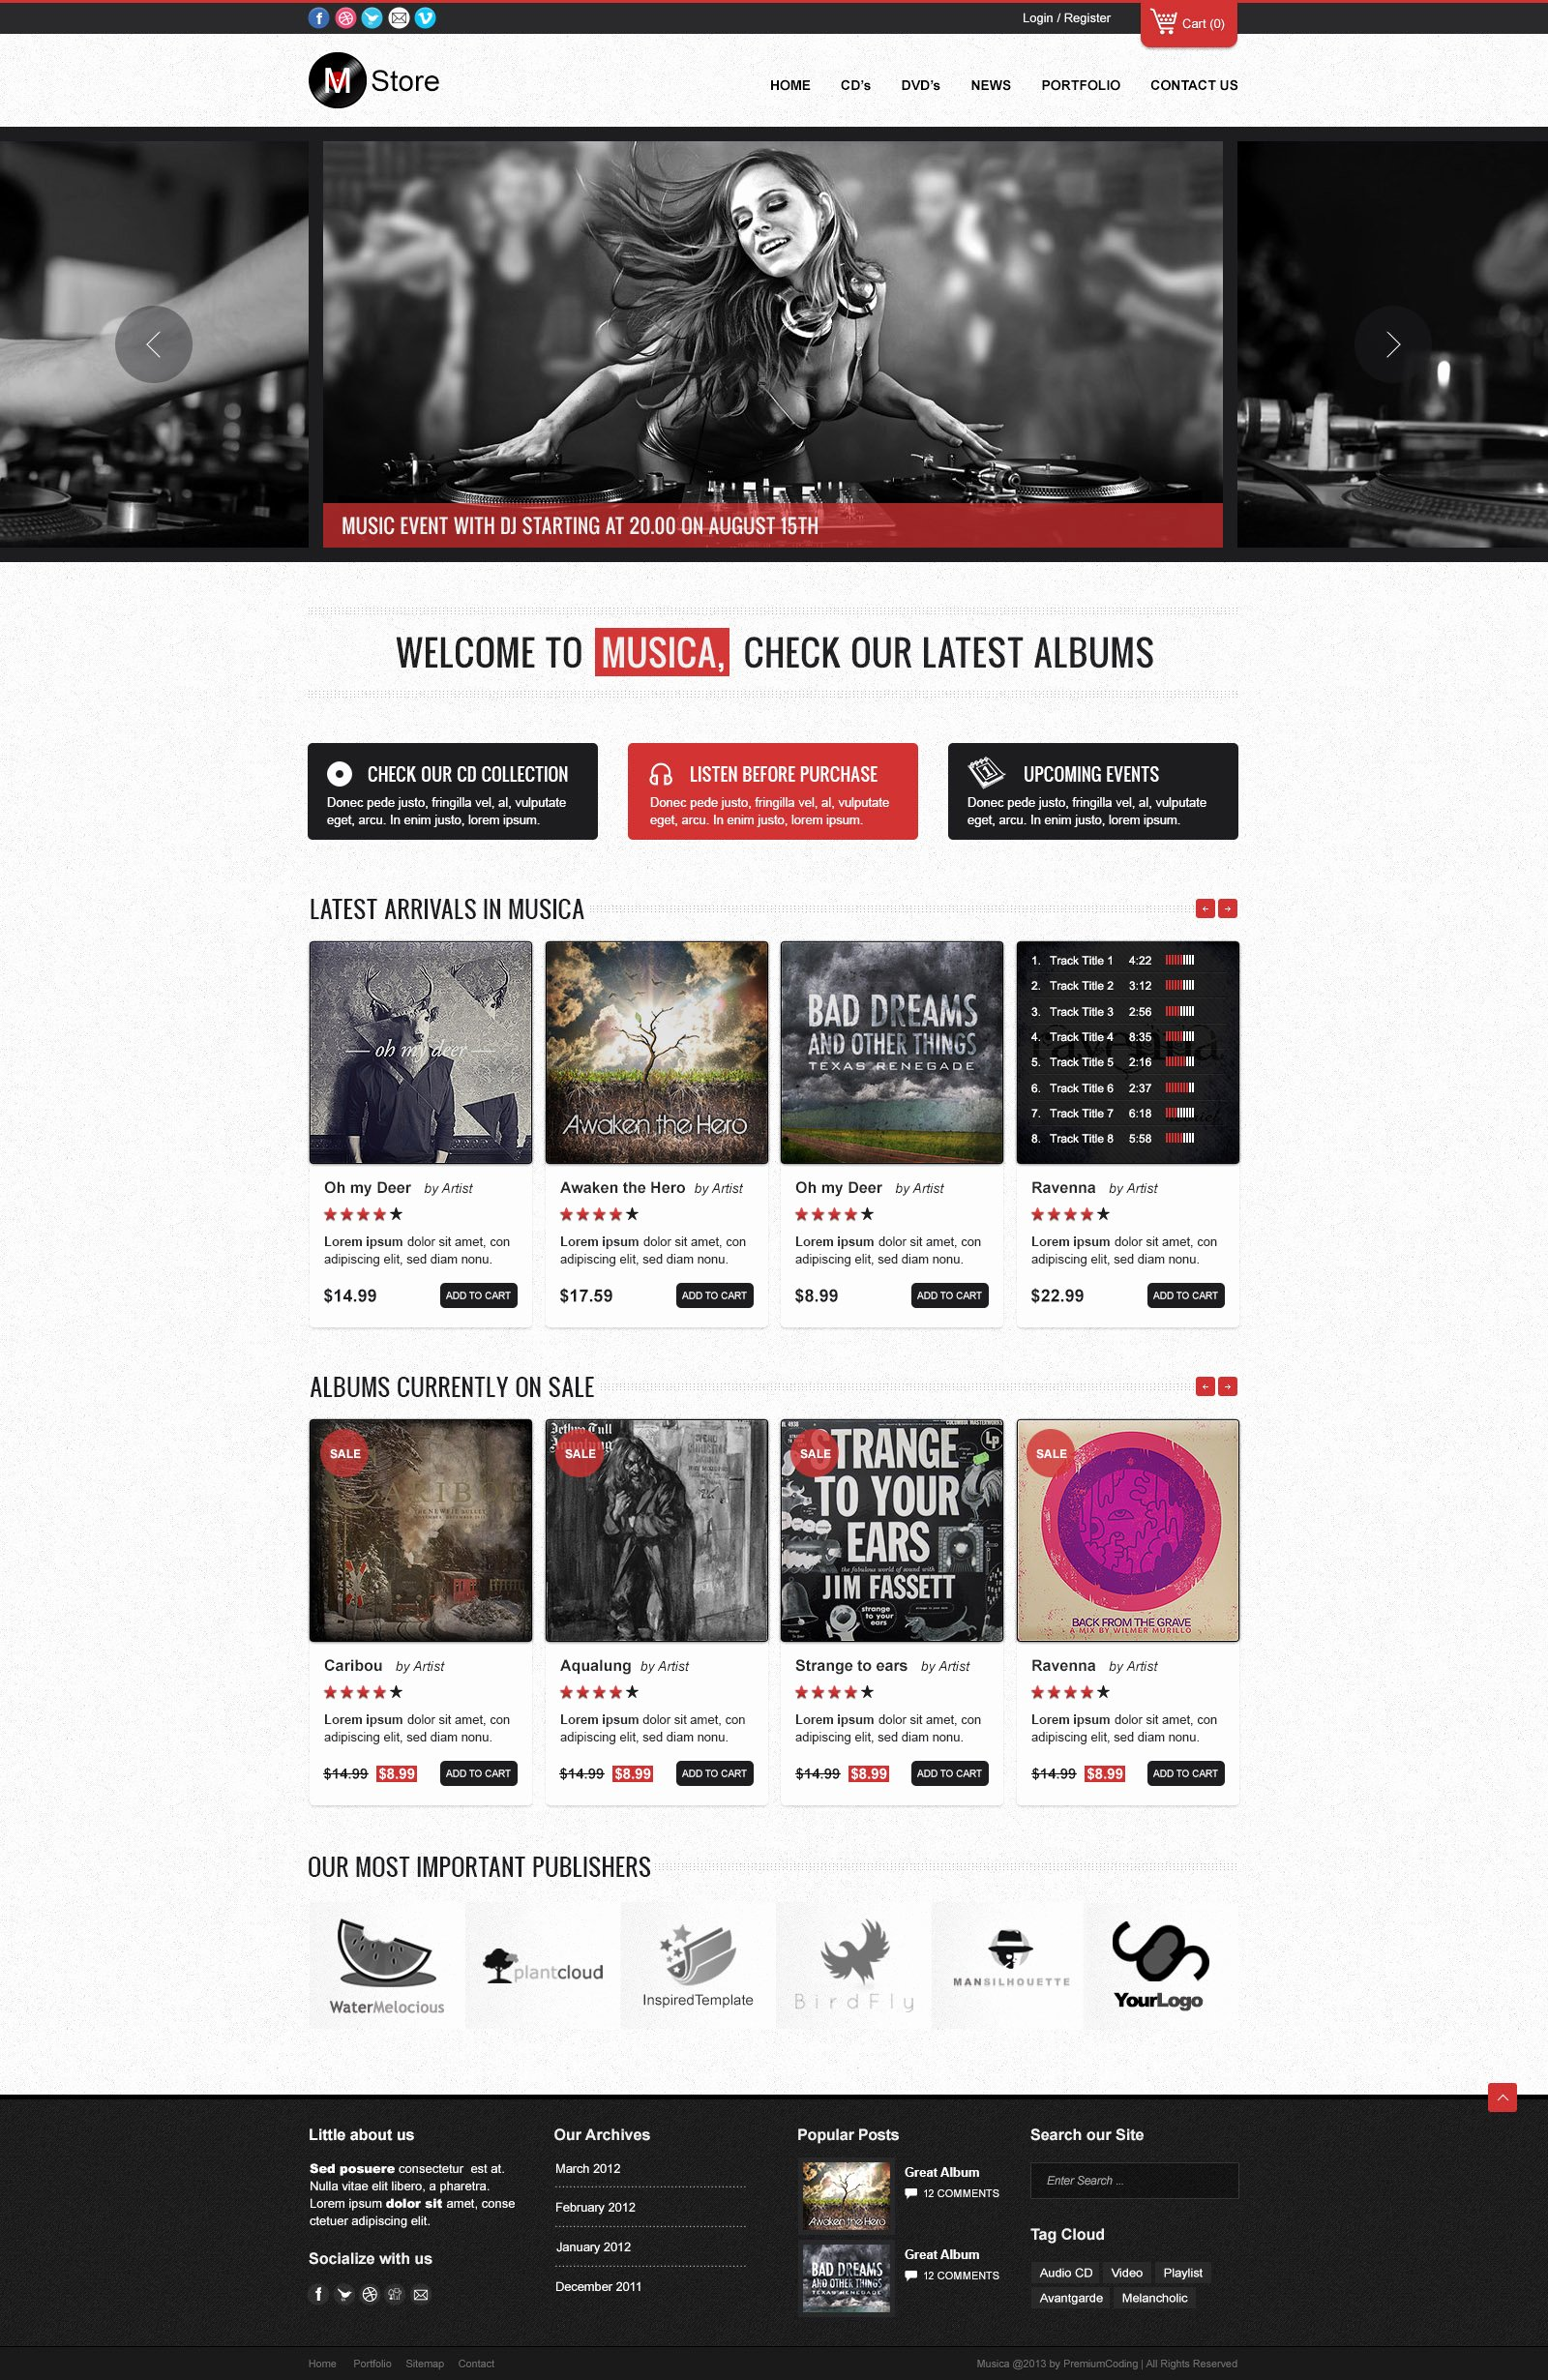 Template for Ecommerce Website New Freebie Musica E Merce Website Template Psd